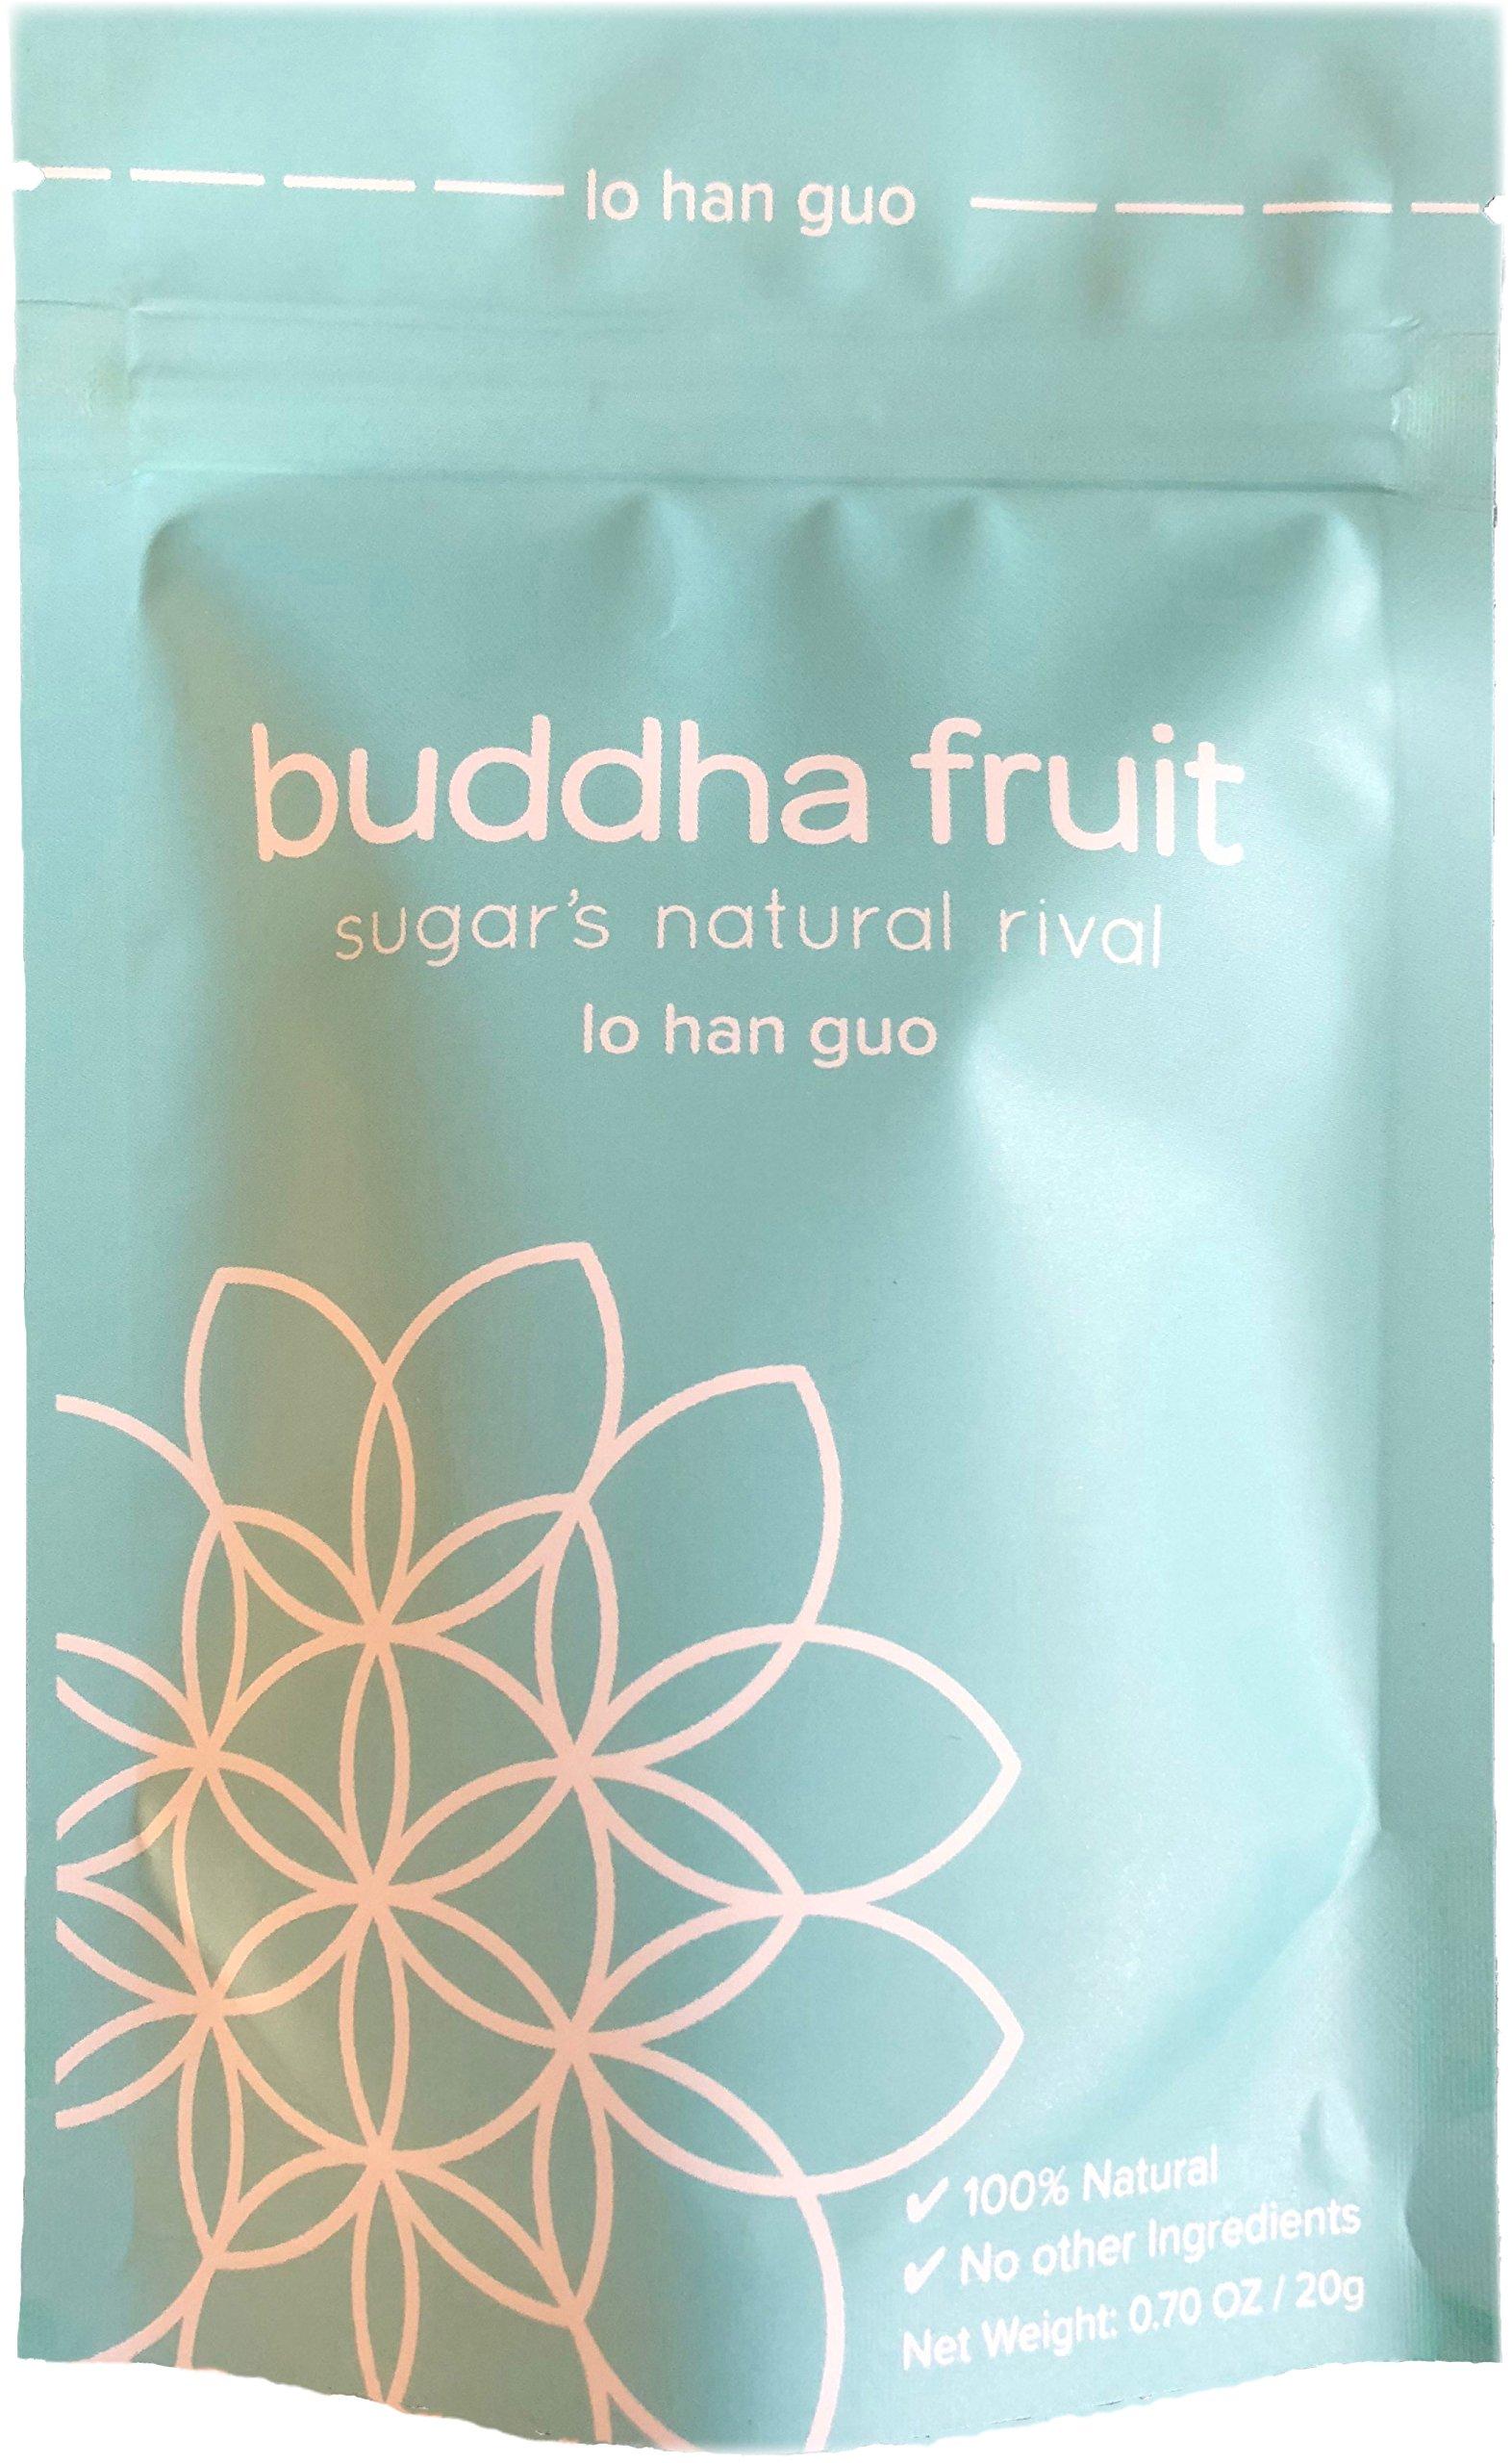 Buddha Fruit - Lo Han Guo - Monk Fruit Extract - 20g - Natural Sugar alternative